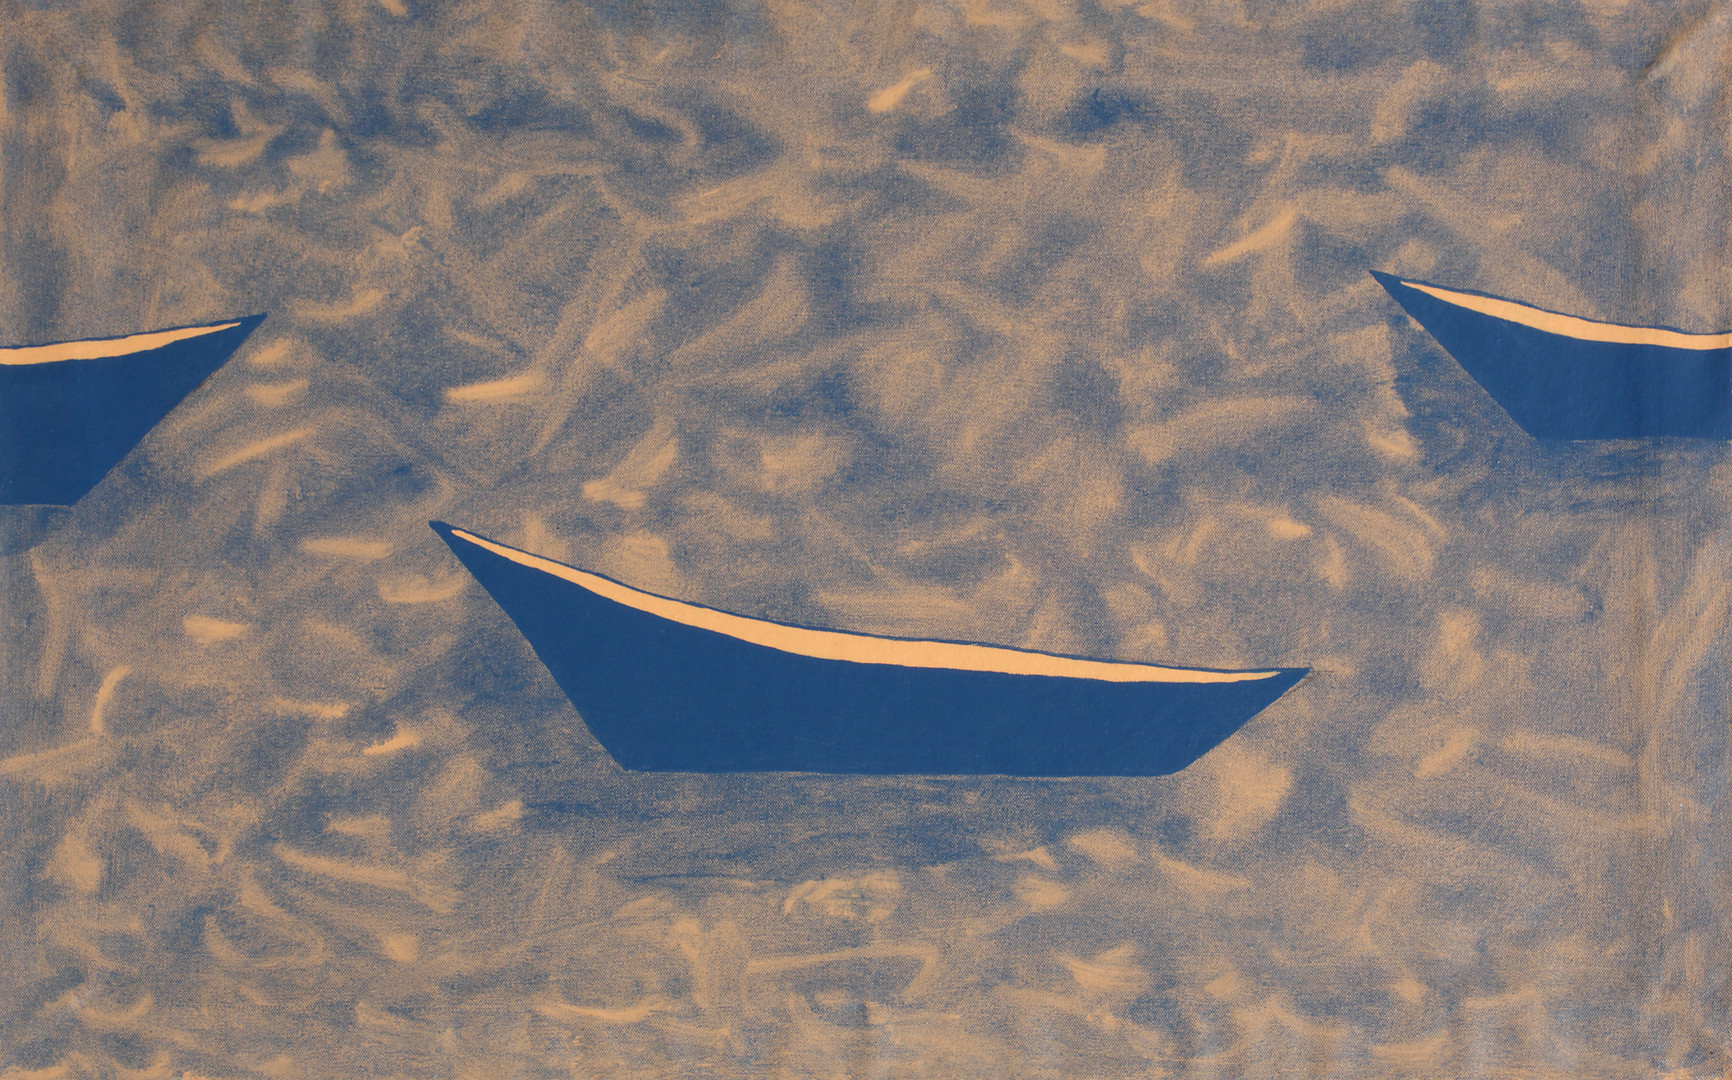 Rowboats on the Bay